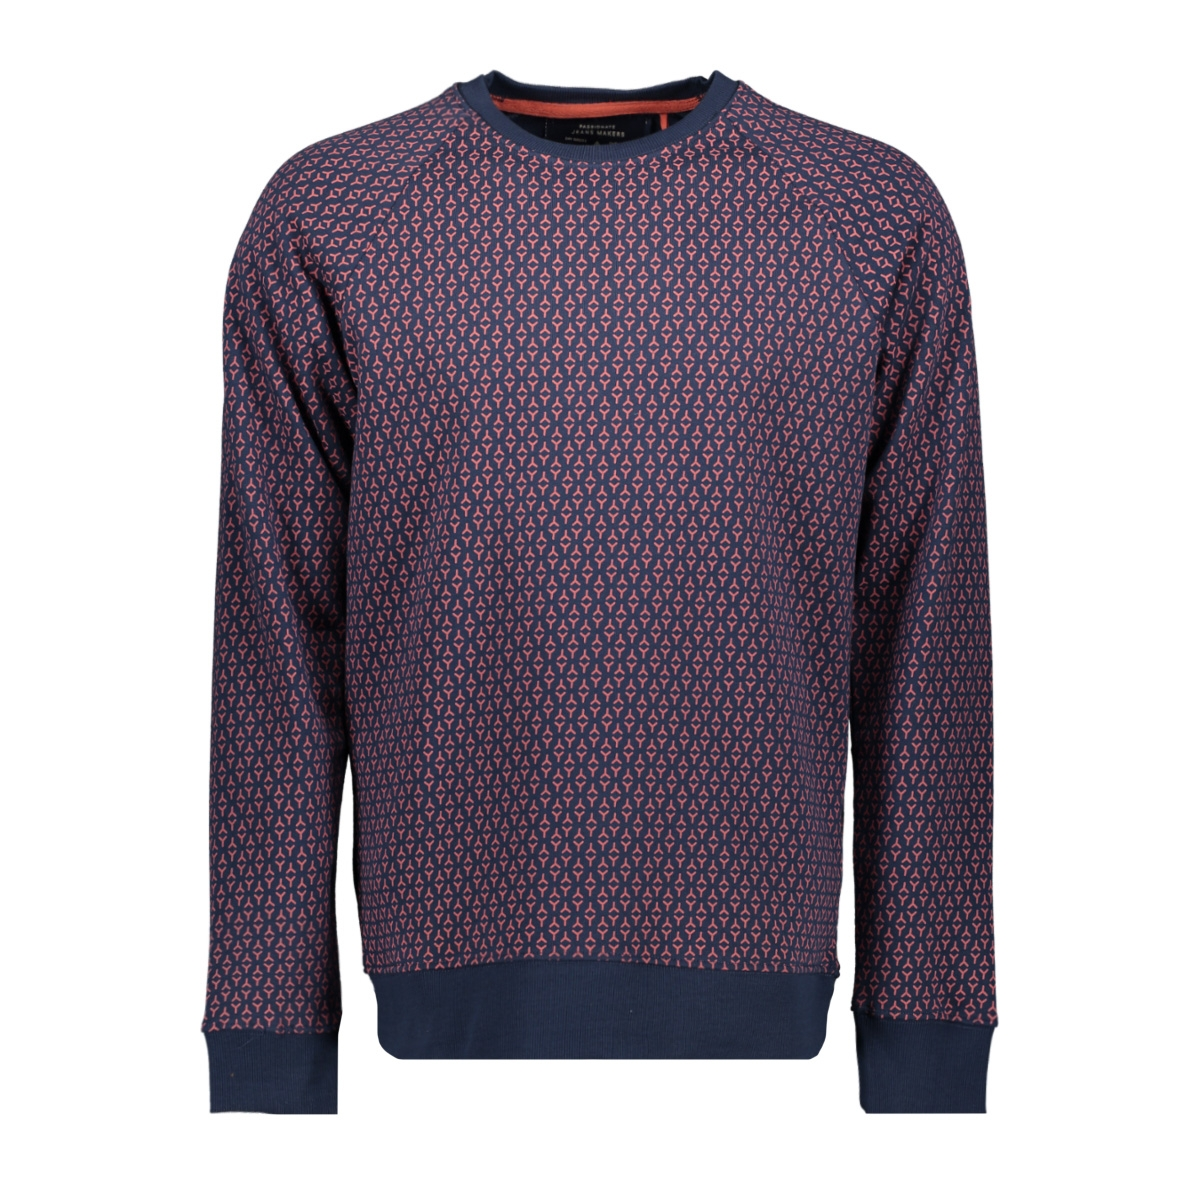 onsfree raglan crew aop 3741 22013741 only & sons sweater dress blues